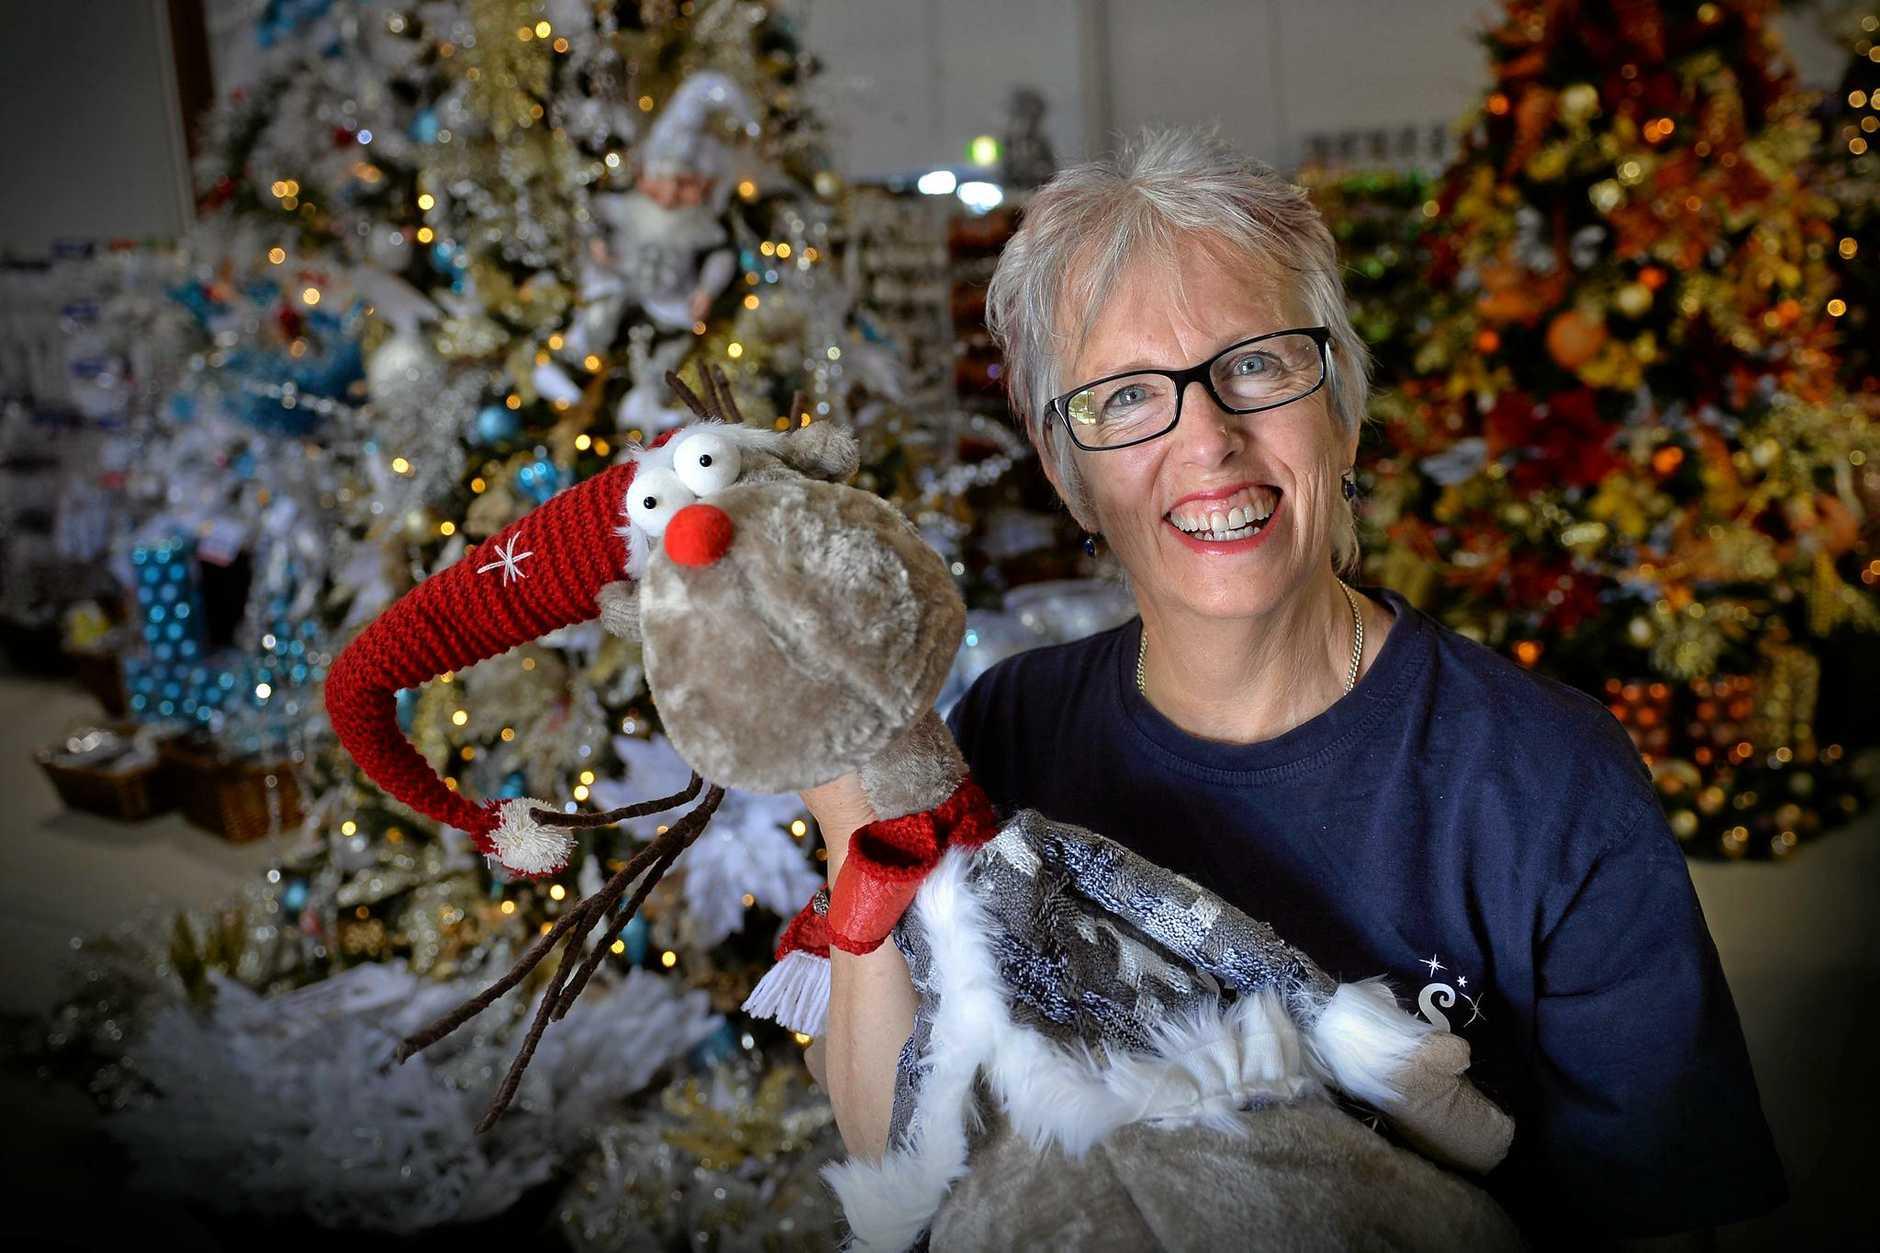 Christmas Decorations In Stores Already  from media.apnarm.net.au